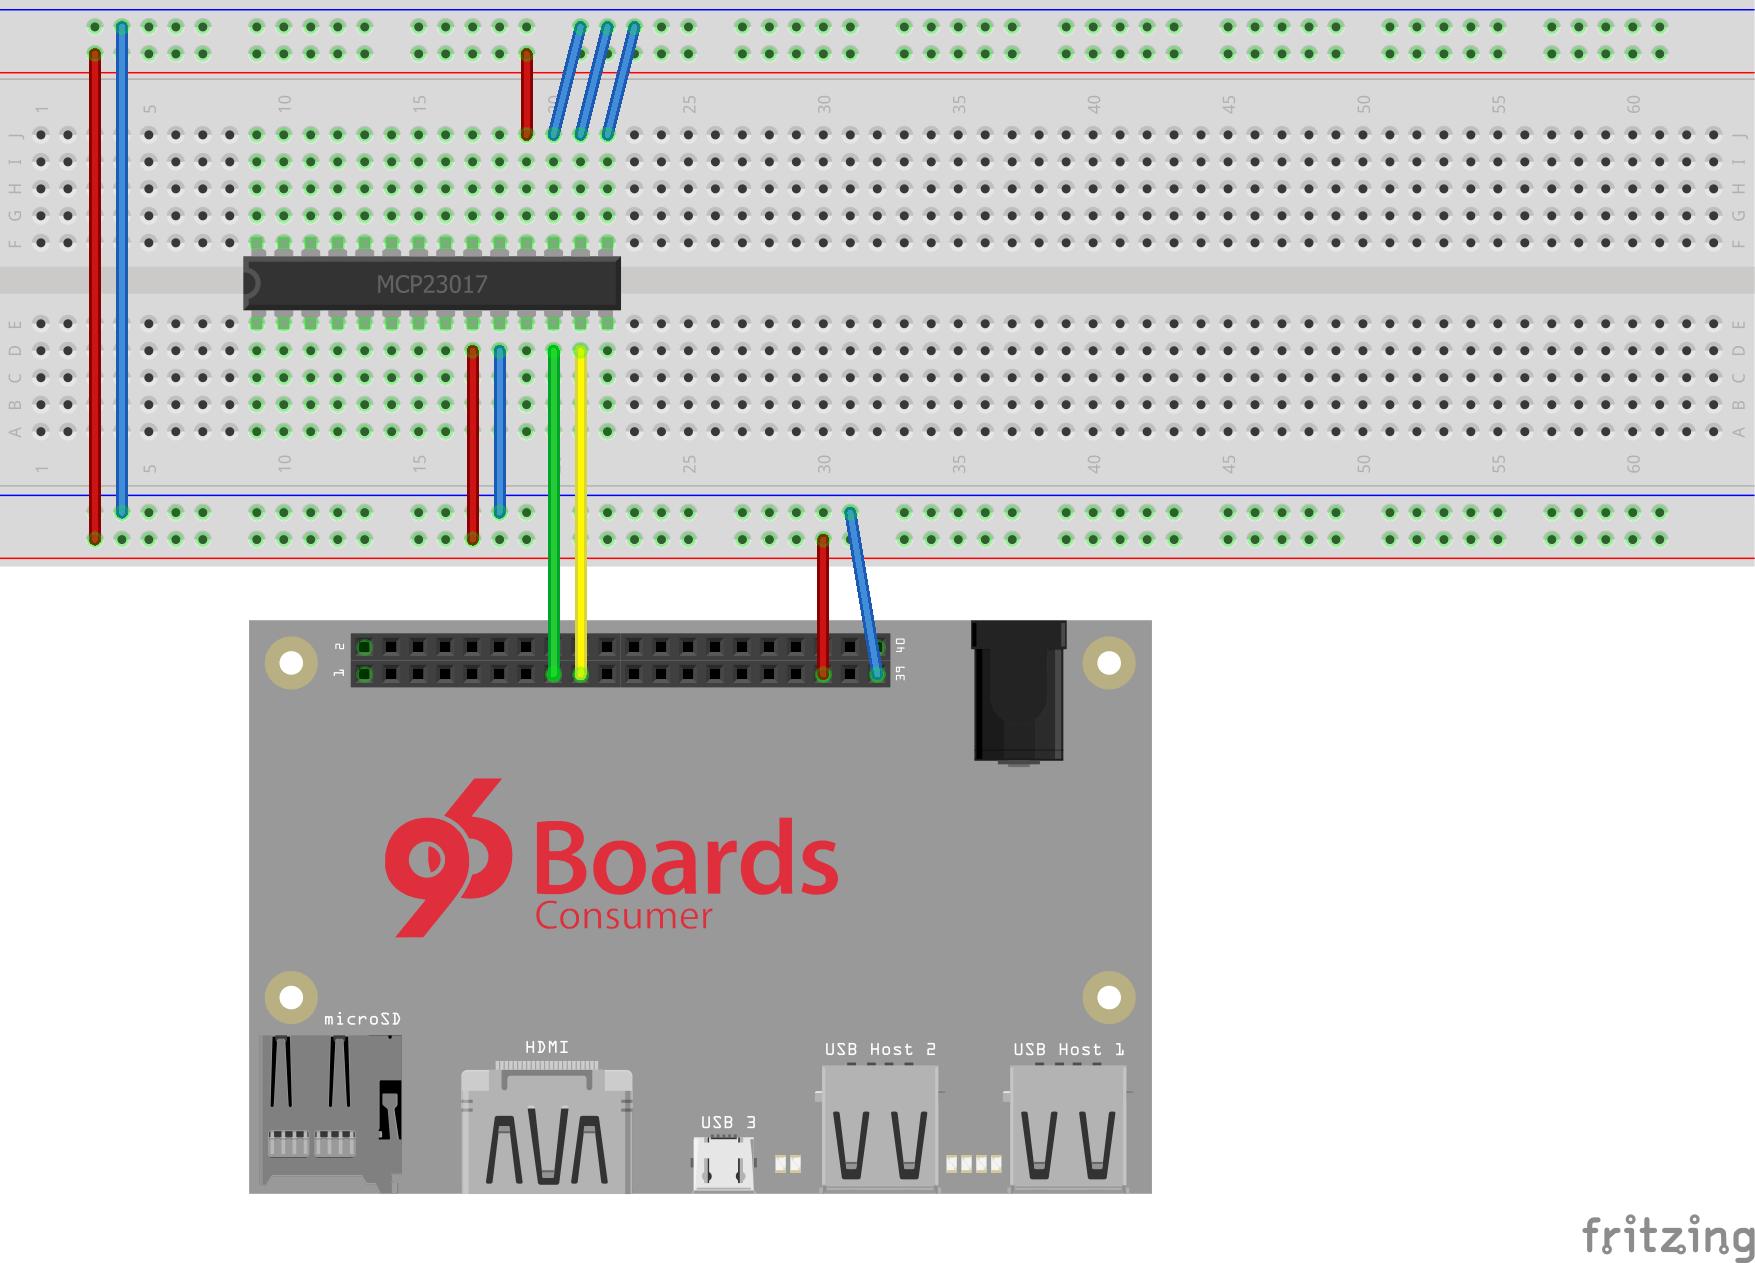 DragonBoard 410c & MCP23017 Breadboard Wiring